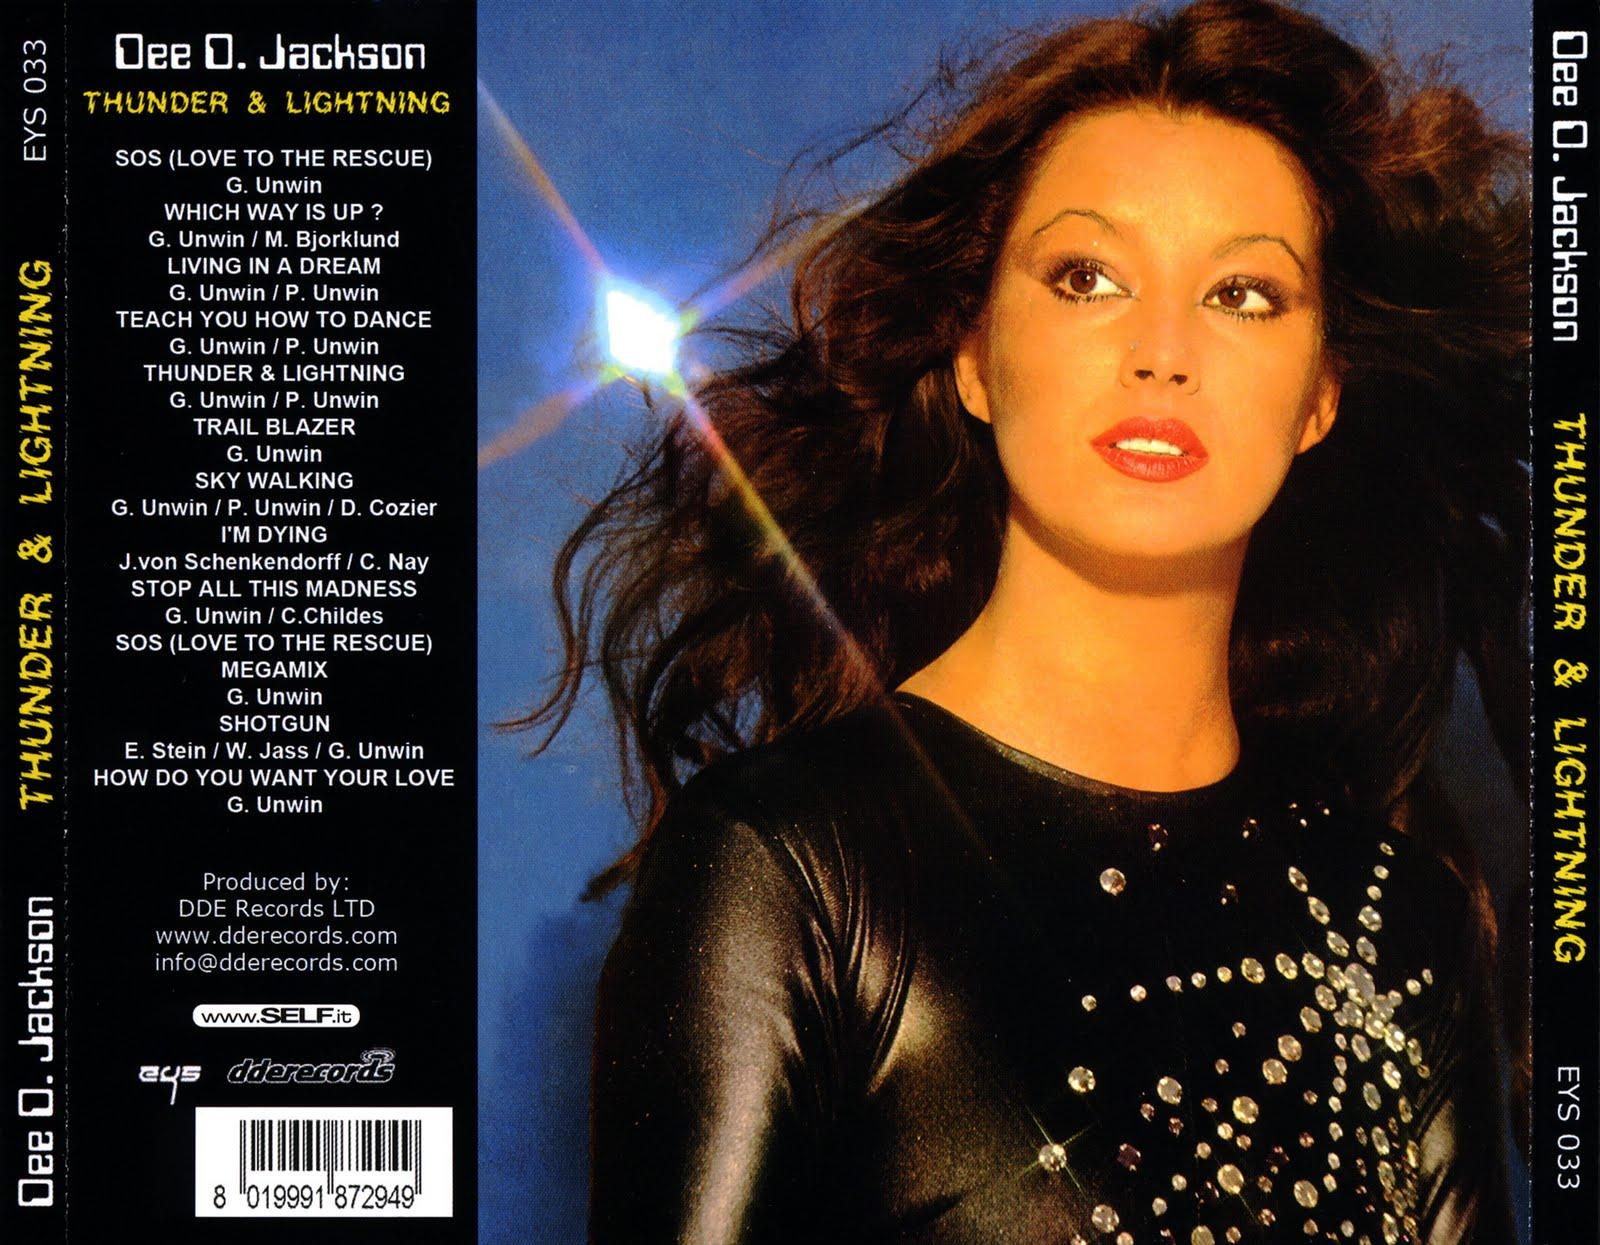 Dee D. Jackson - Thunder And Lightning